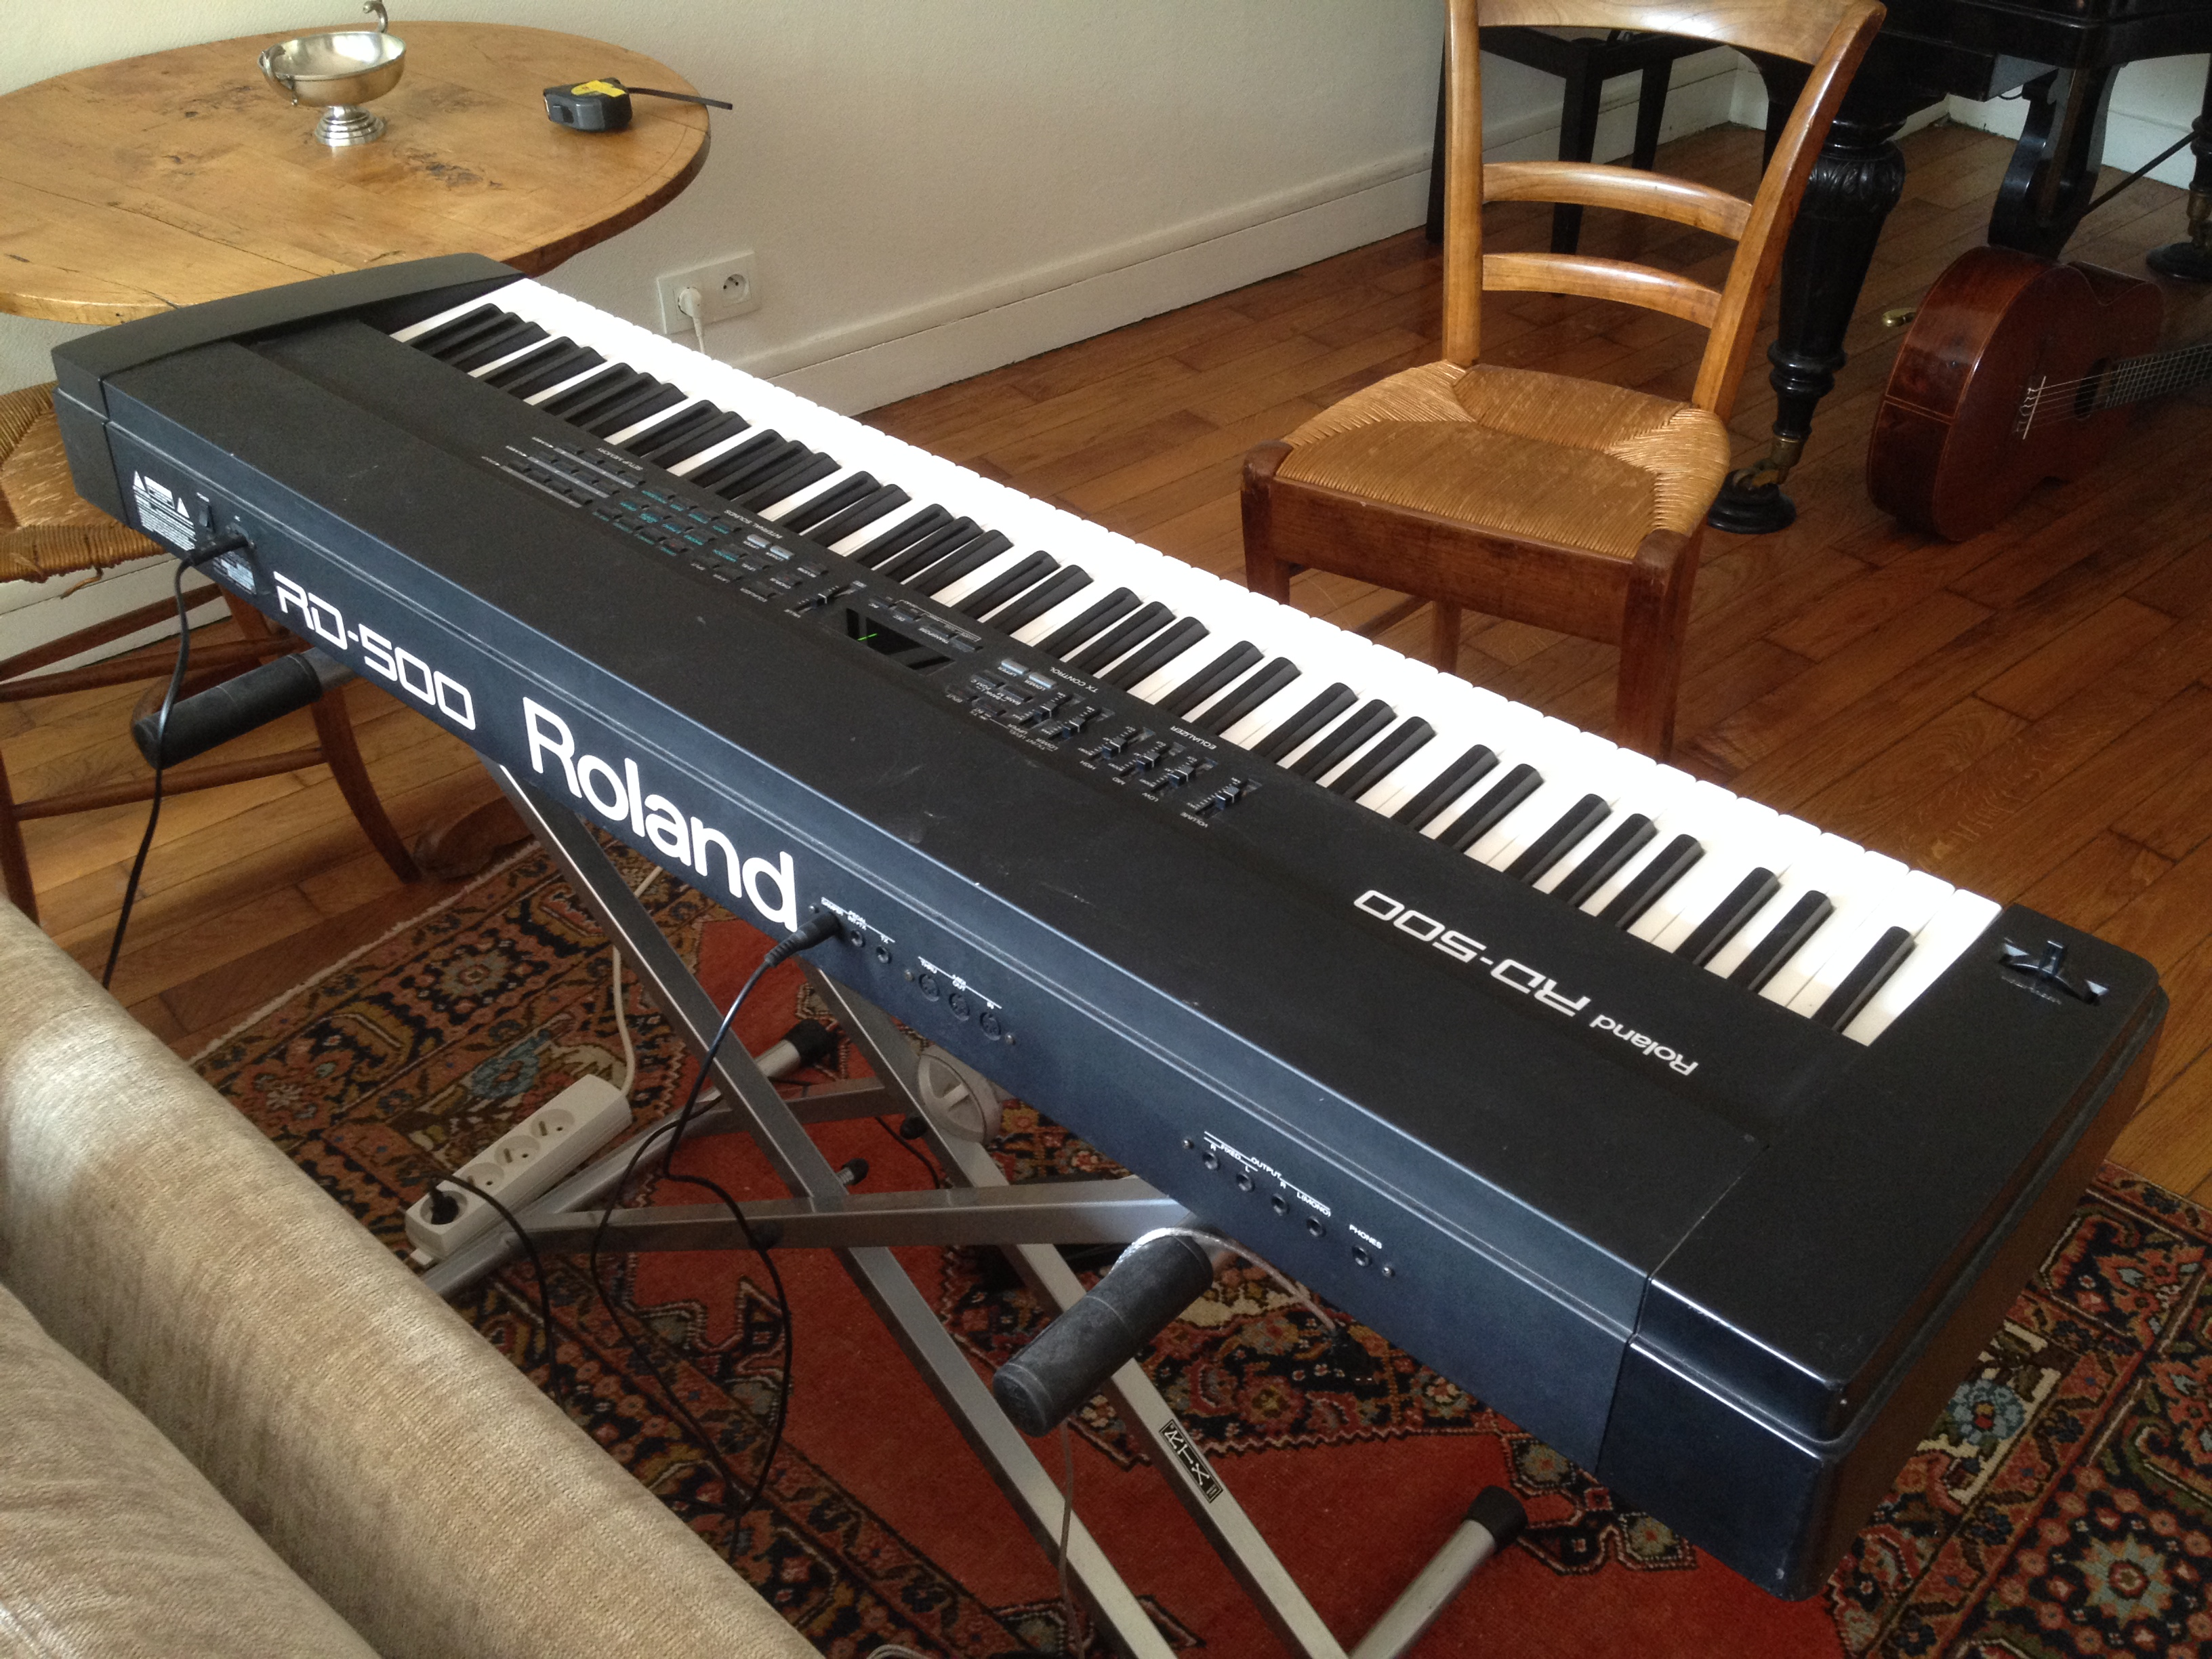 Piano Digital Roland Rd 500 : roland rd 500 image 912604 audiofanzine ~ Vivirlamusica.com Haus und Dekorationen